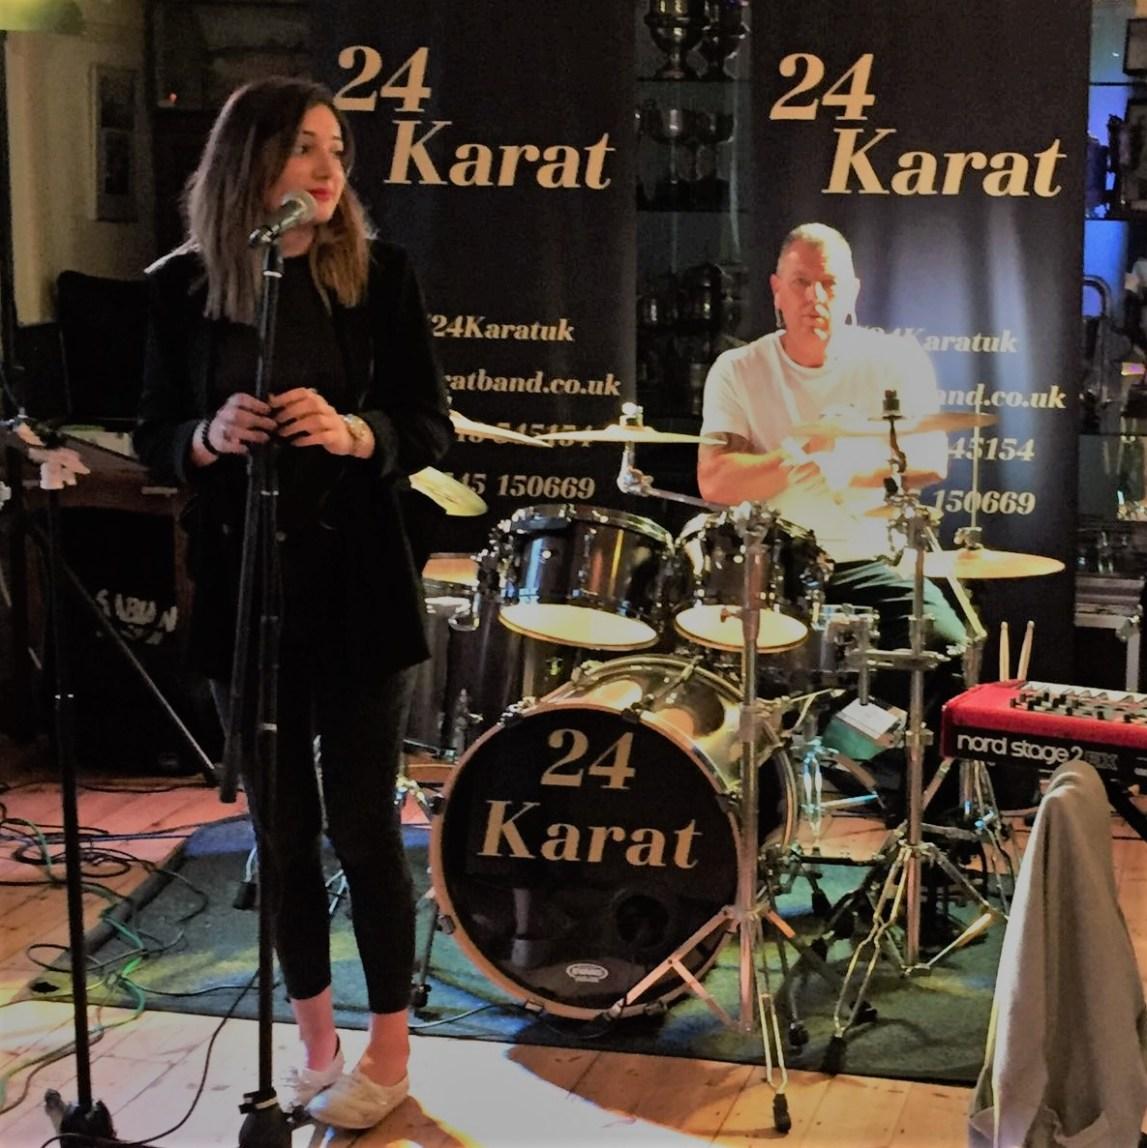 Live Wedding Band 24 Karat For Hire